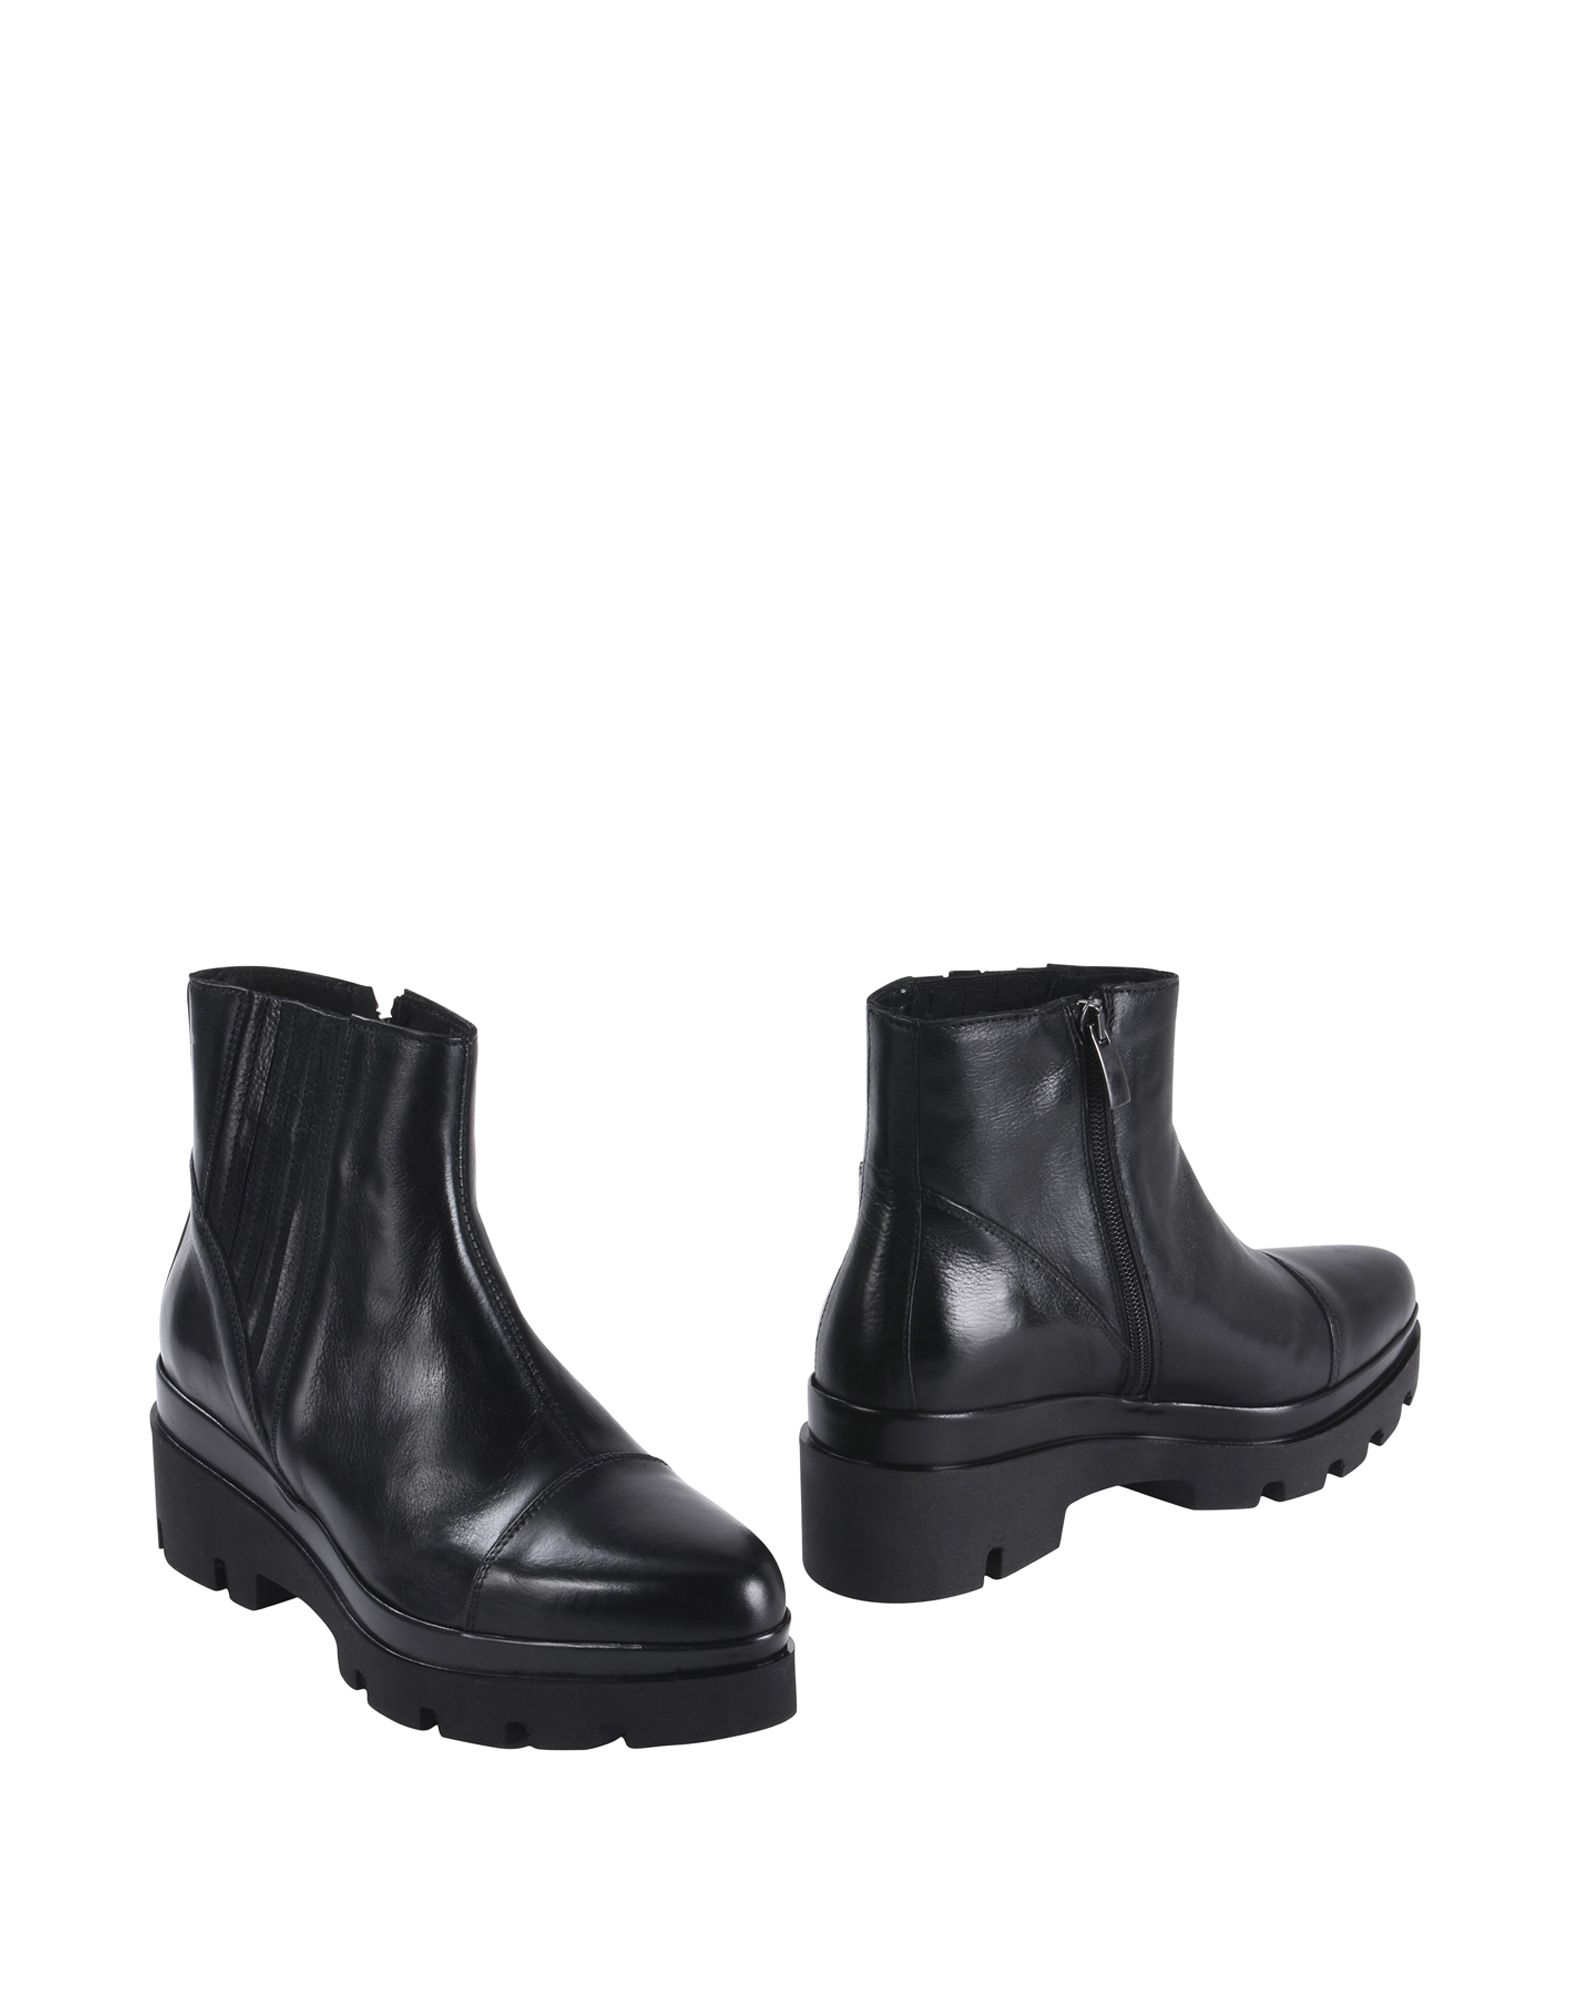 CARLO PAZOLINI Damen Stiefelette Farbe Schwarz Größe 7